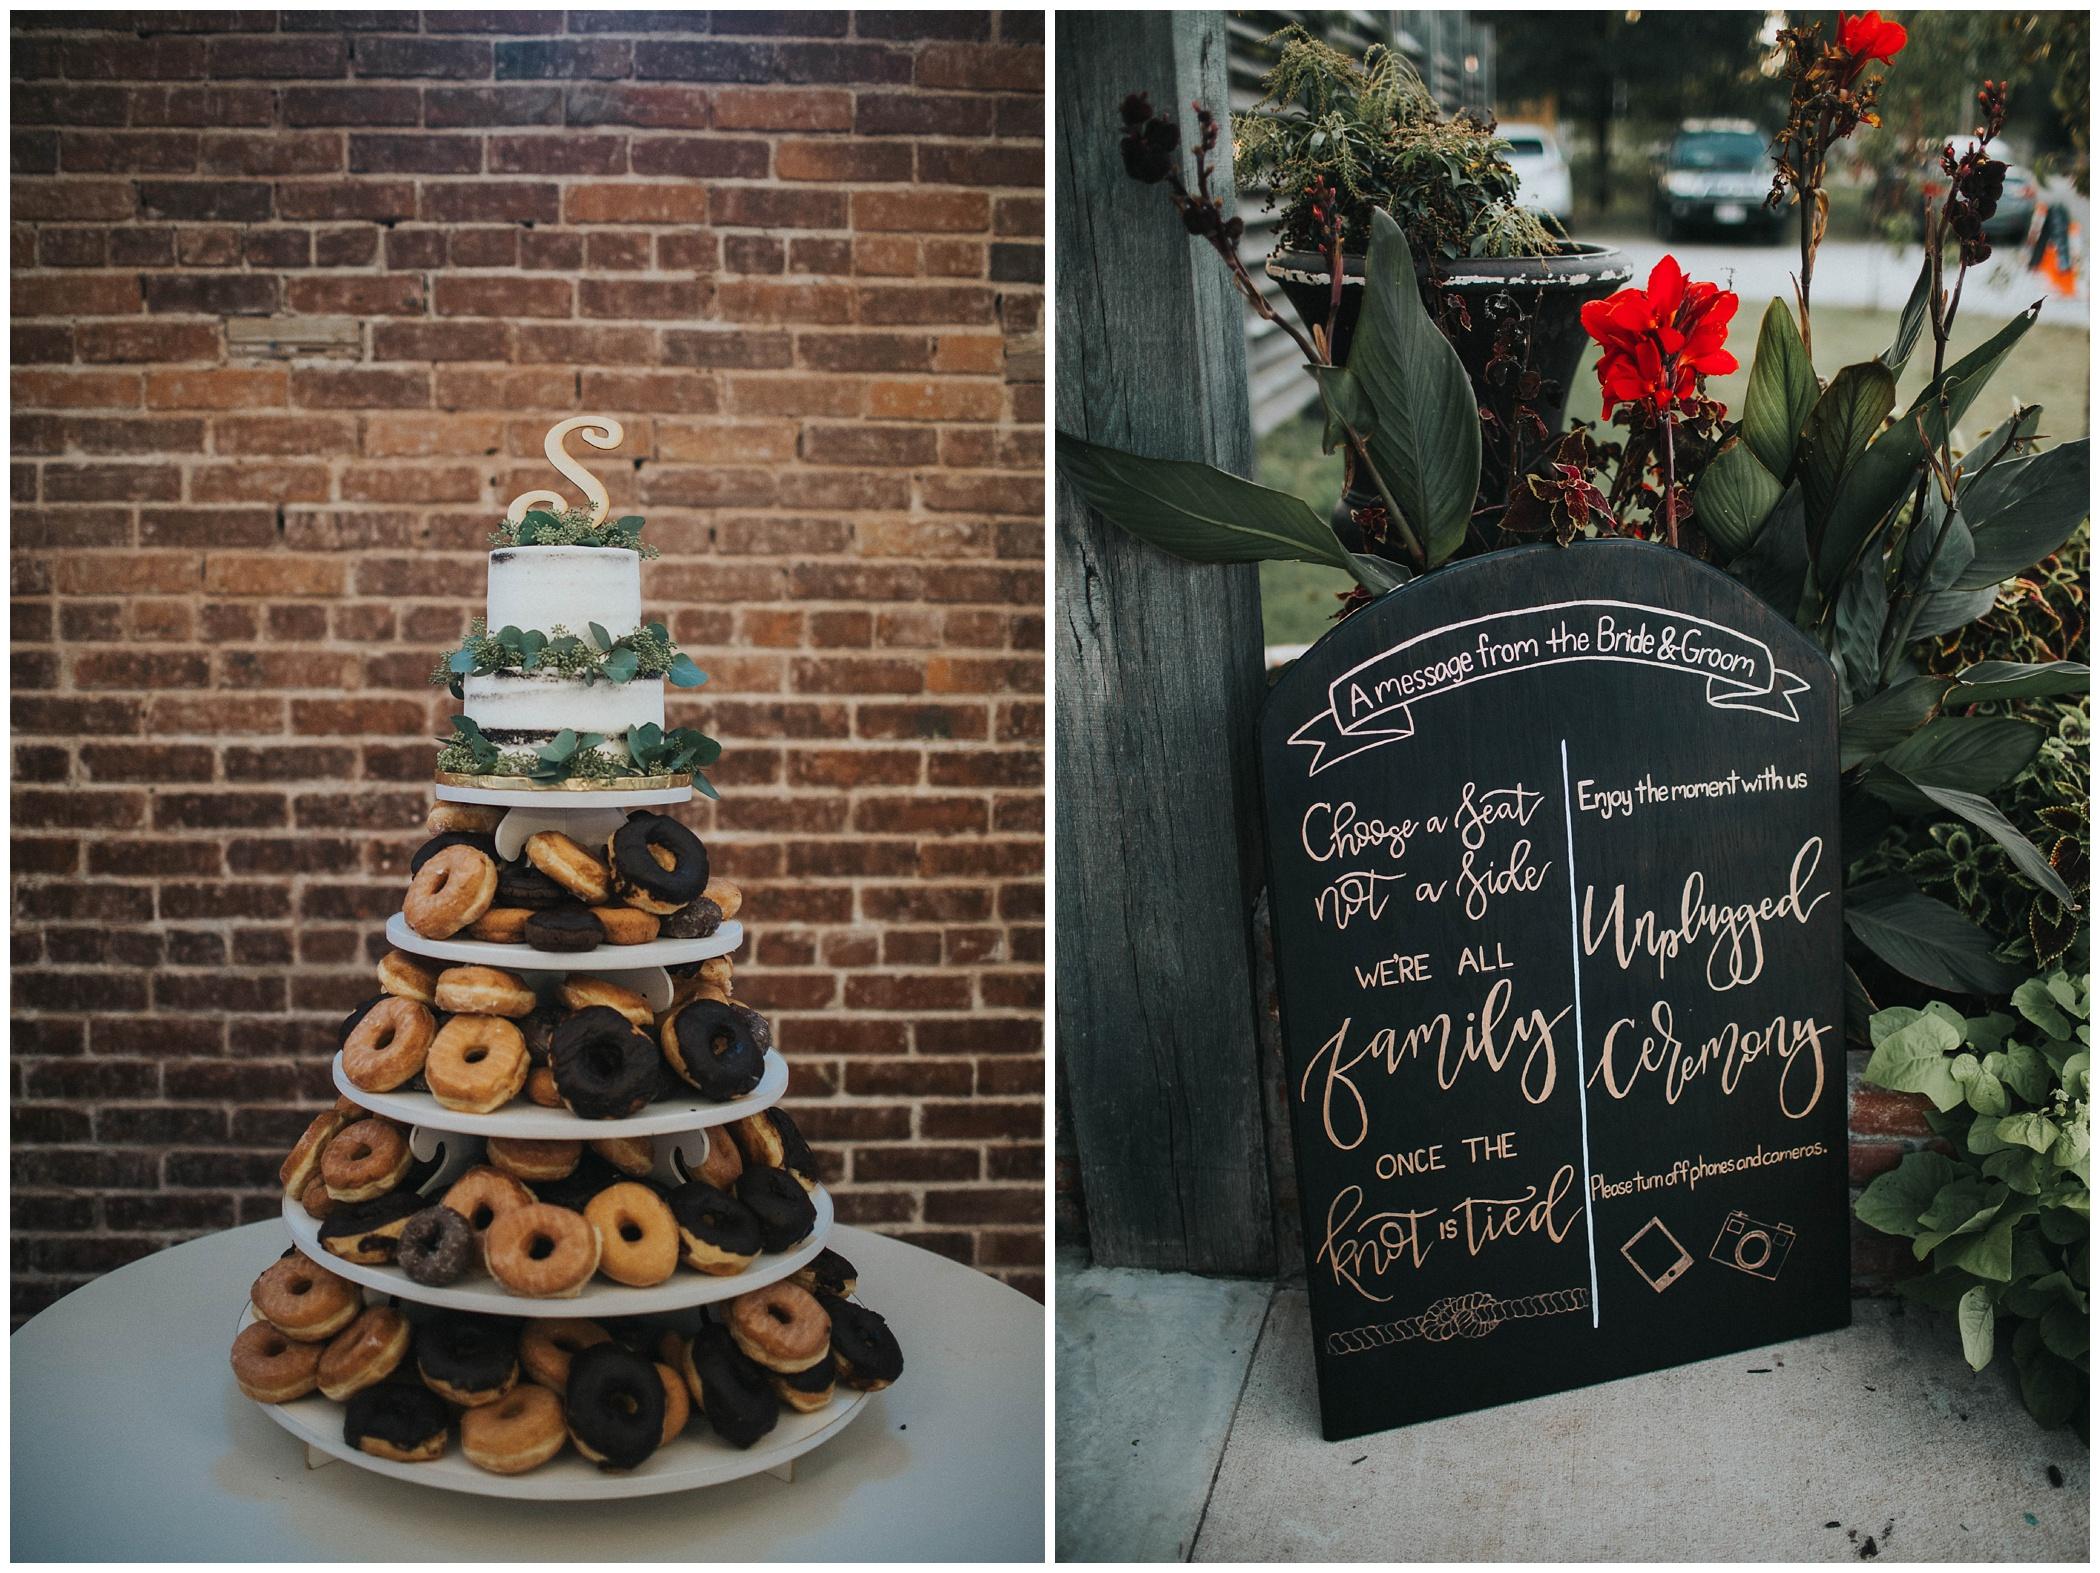 ravington, donut, cake, the, ravington, centerson, northwest, arkansas, johnsons, photo, wedding, photography